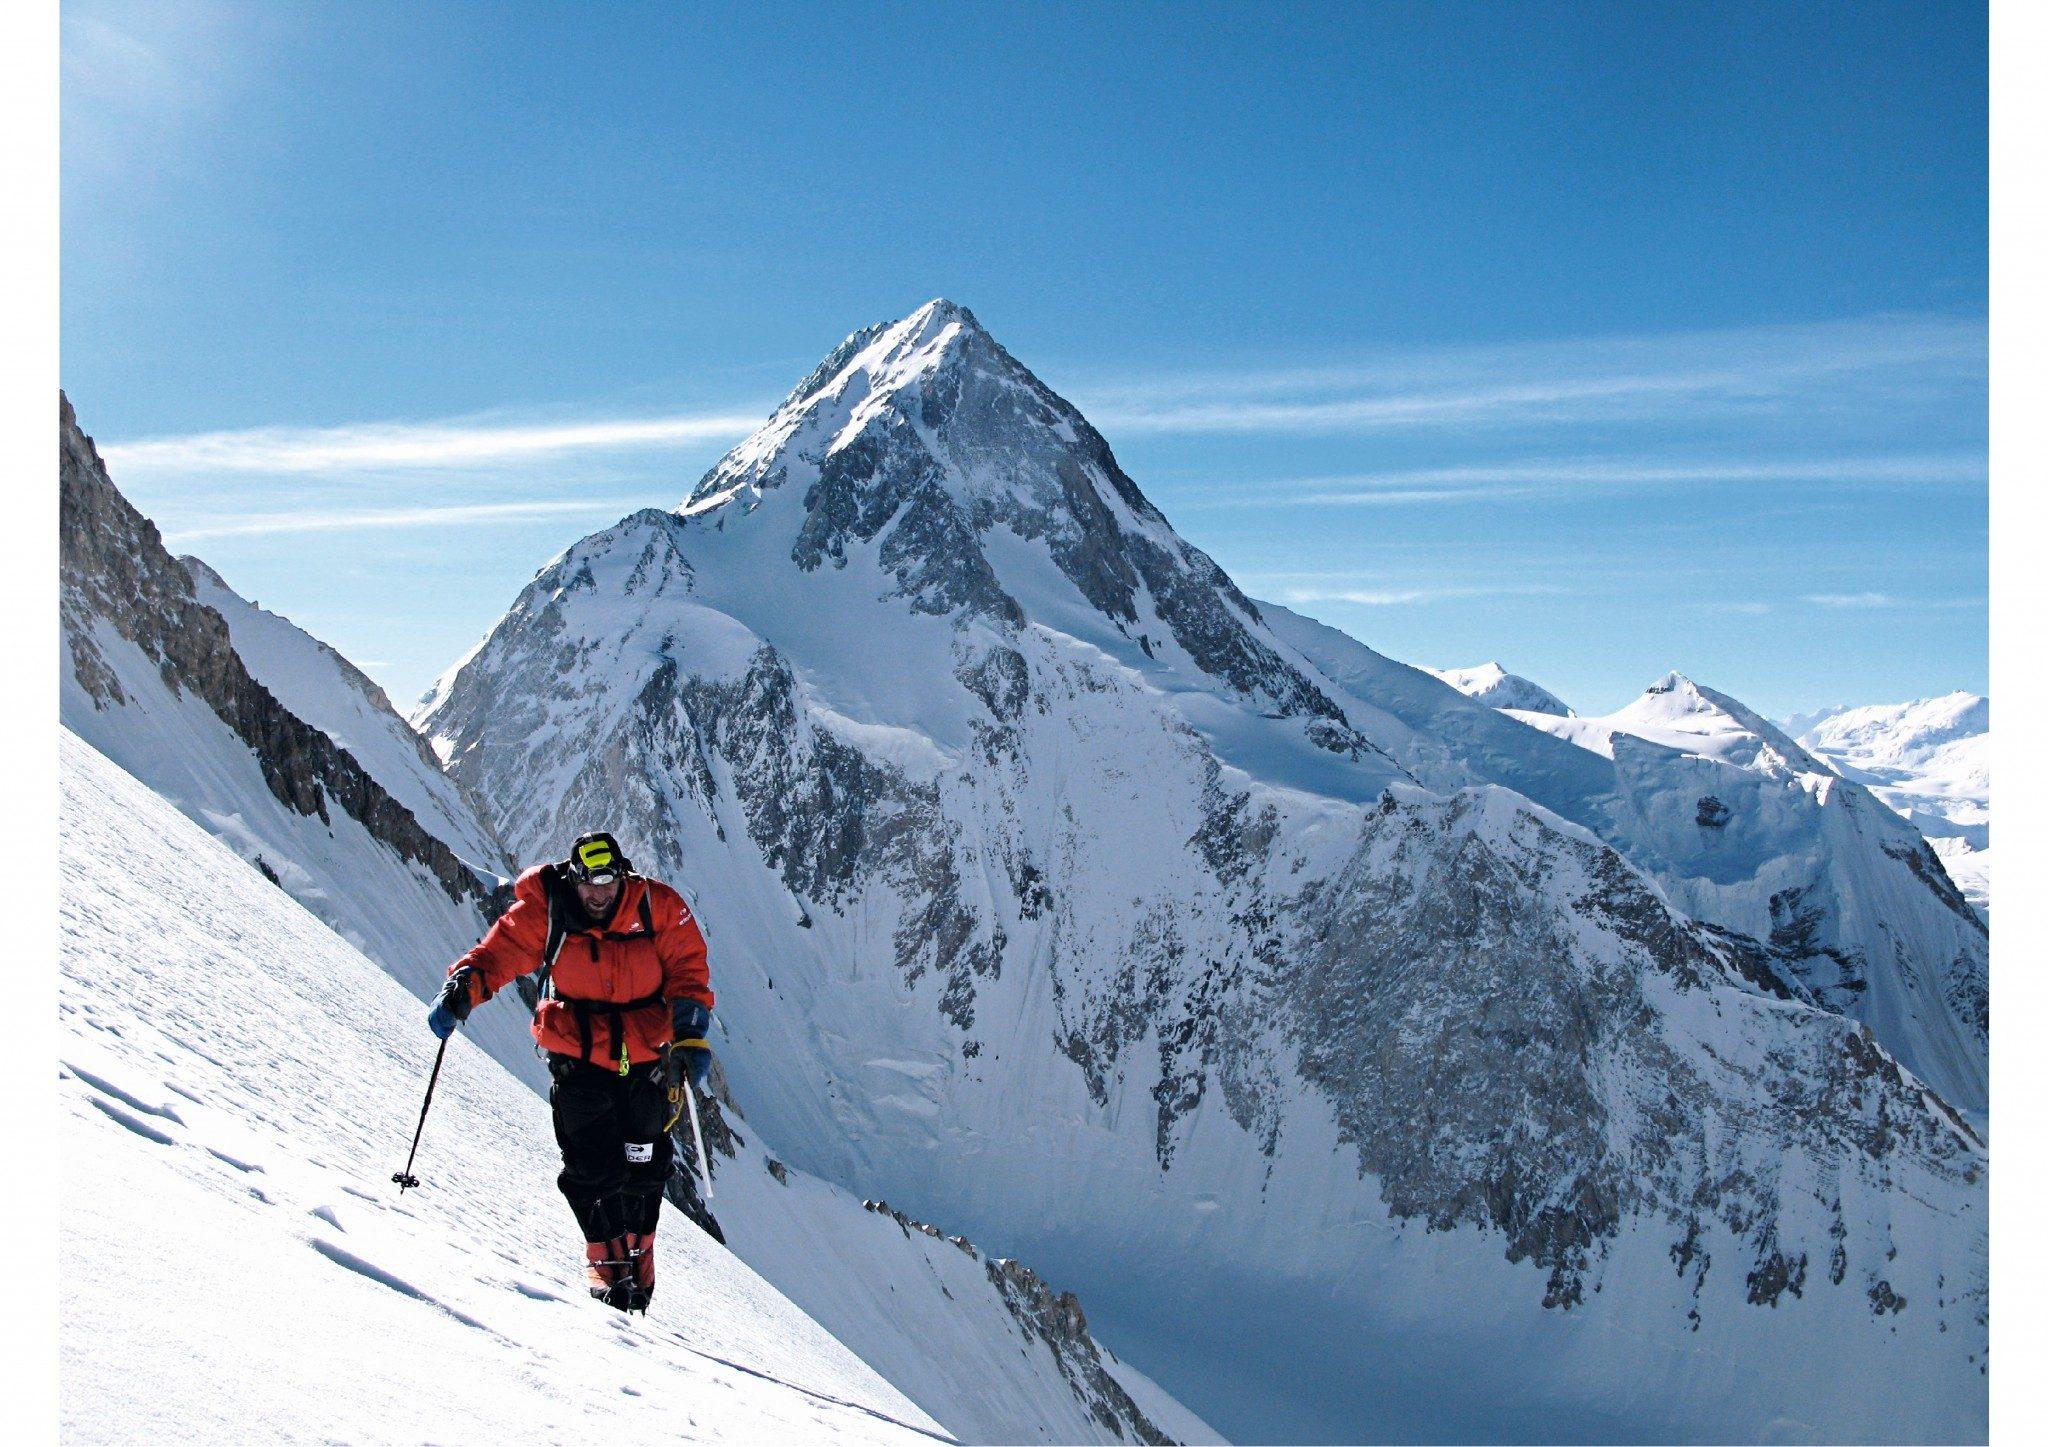 Vouloir toucher les etoiles image Himalaya Expedition